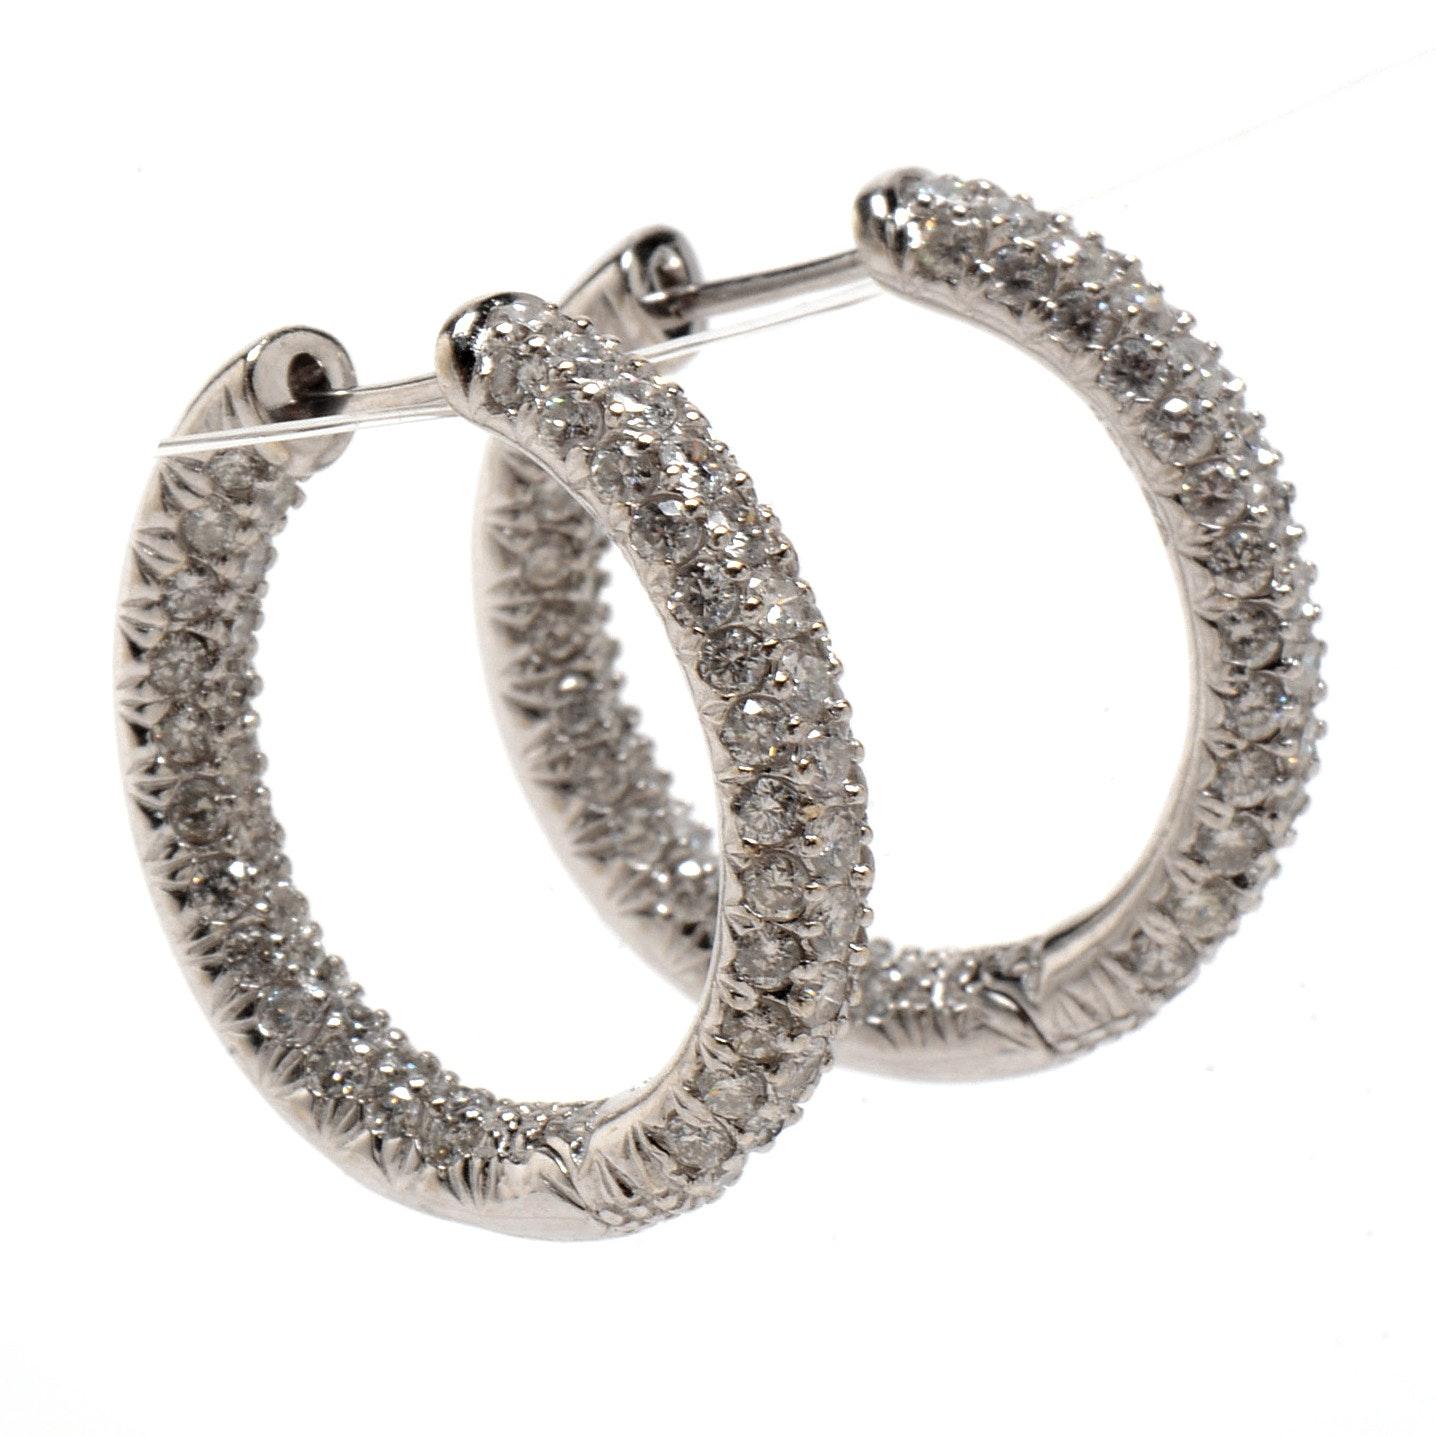 Pair of 18K White Gold 3.29 CTW Diamond Hoop Earrings